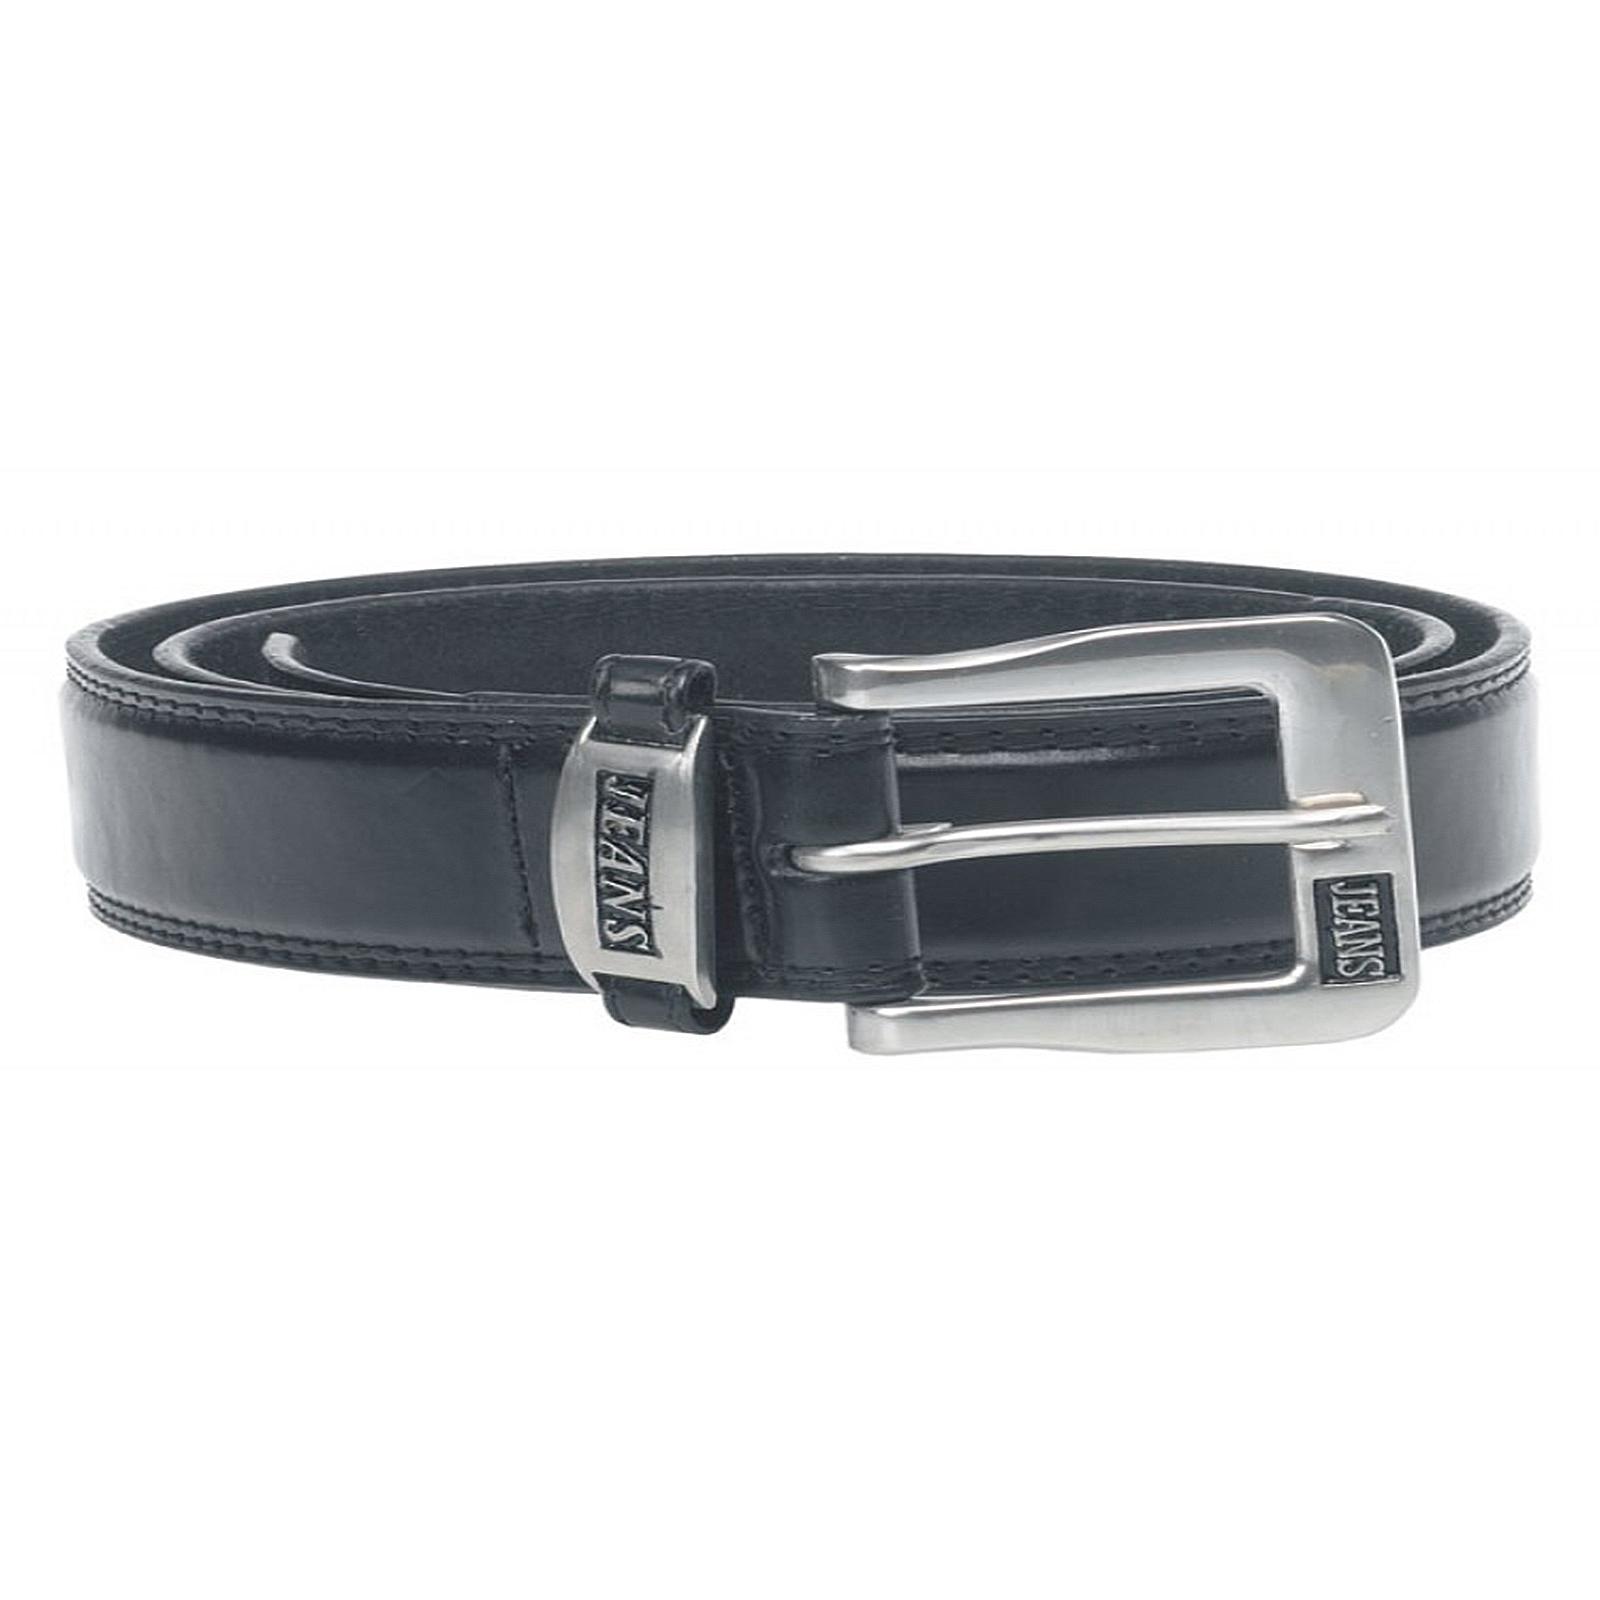 D555 Kingsize Mens Xtenda Belt Bonded Leather With Elastic Insert Metal Buckle